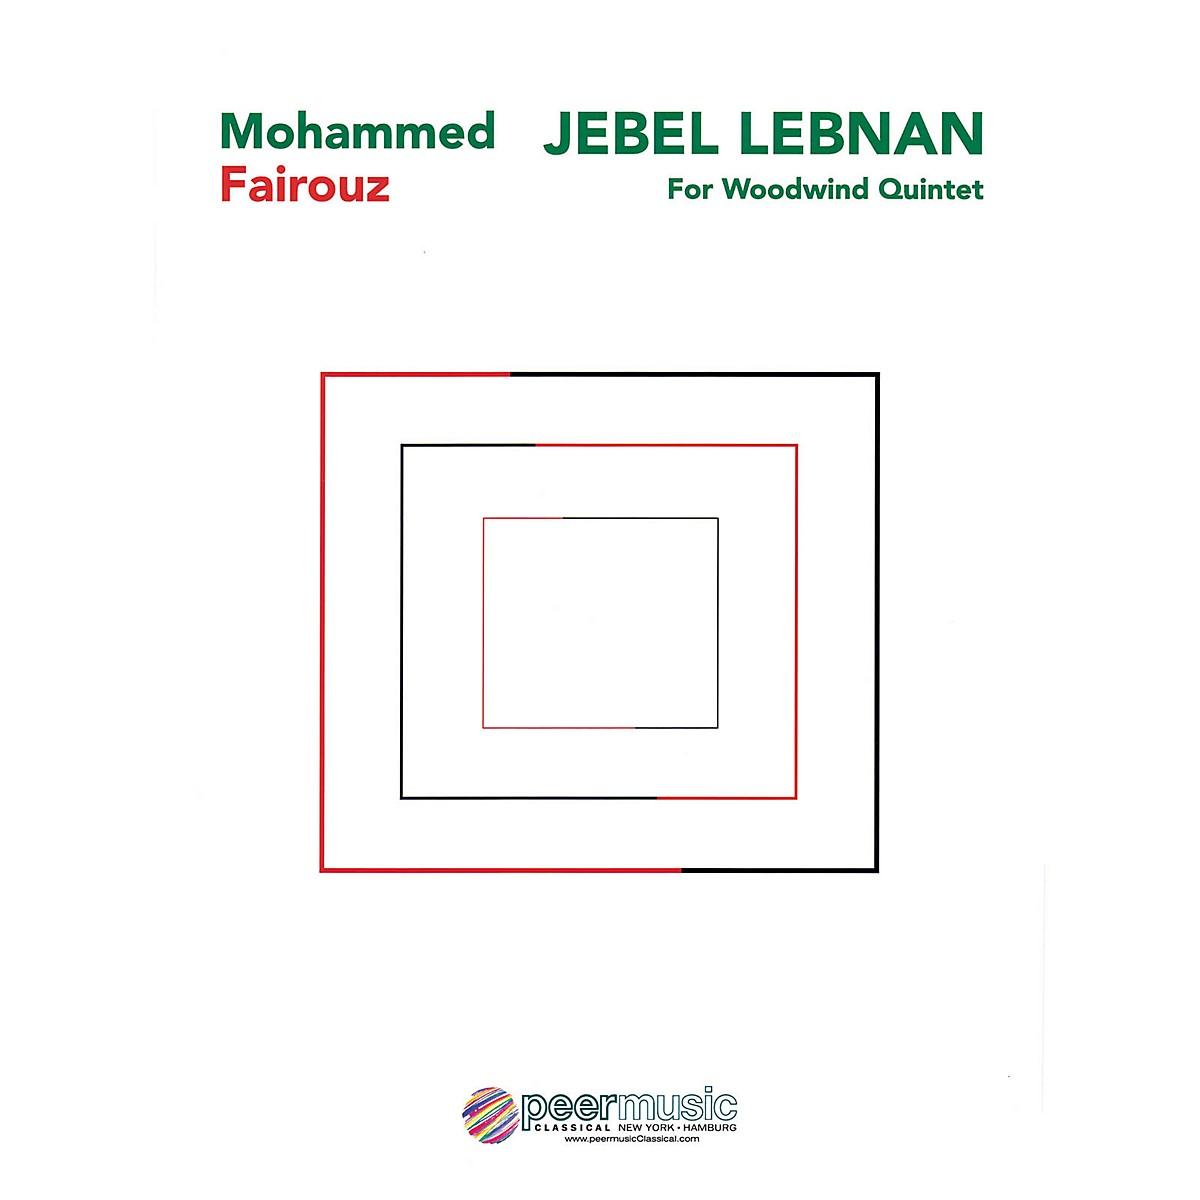 Peer Music Jebel Lebnan (Woodwind Quintet) Peermusic Classical Series by Mohammed Fairouz